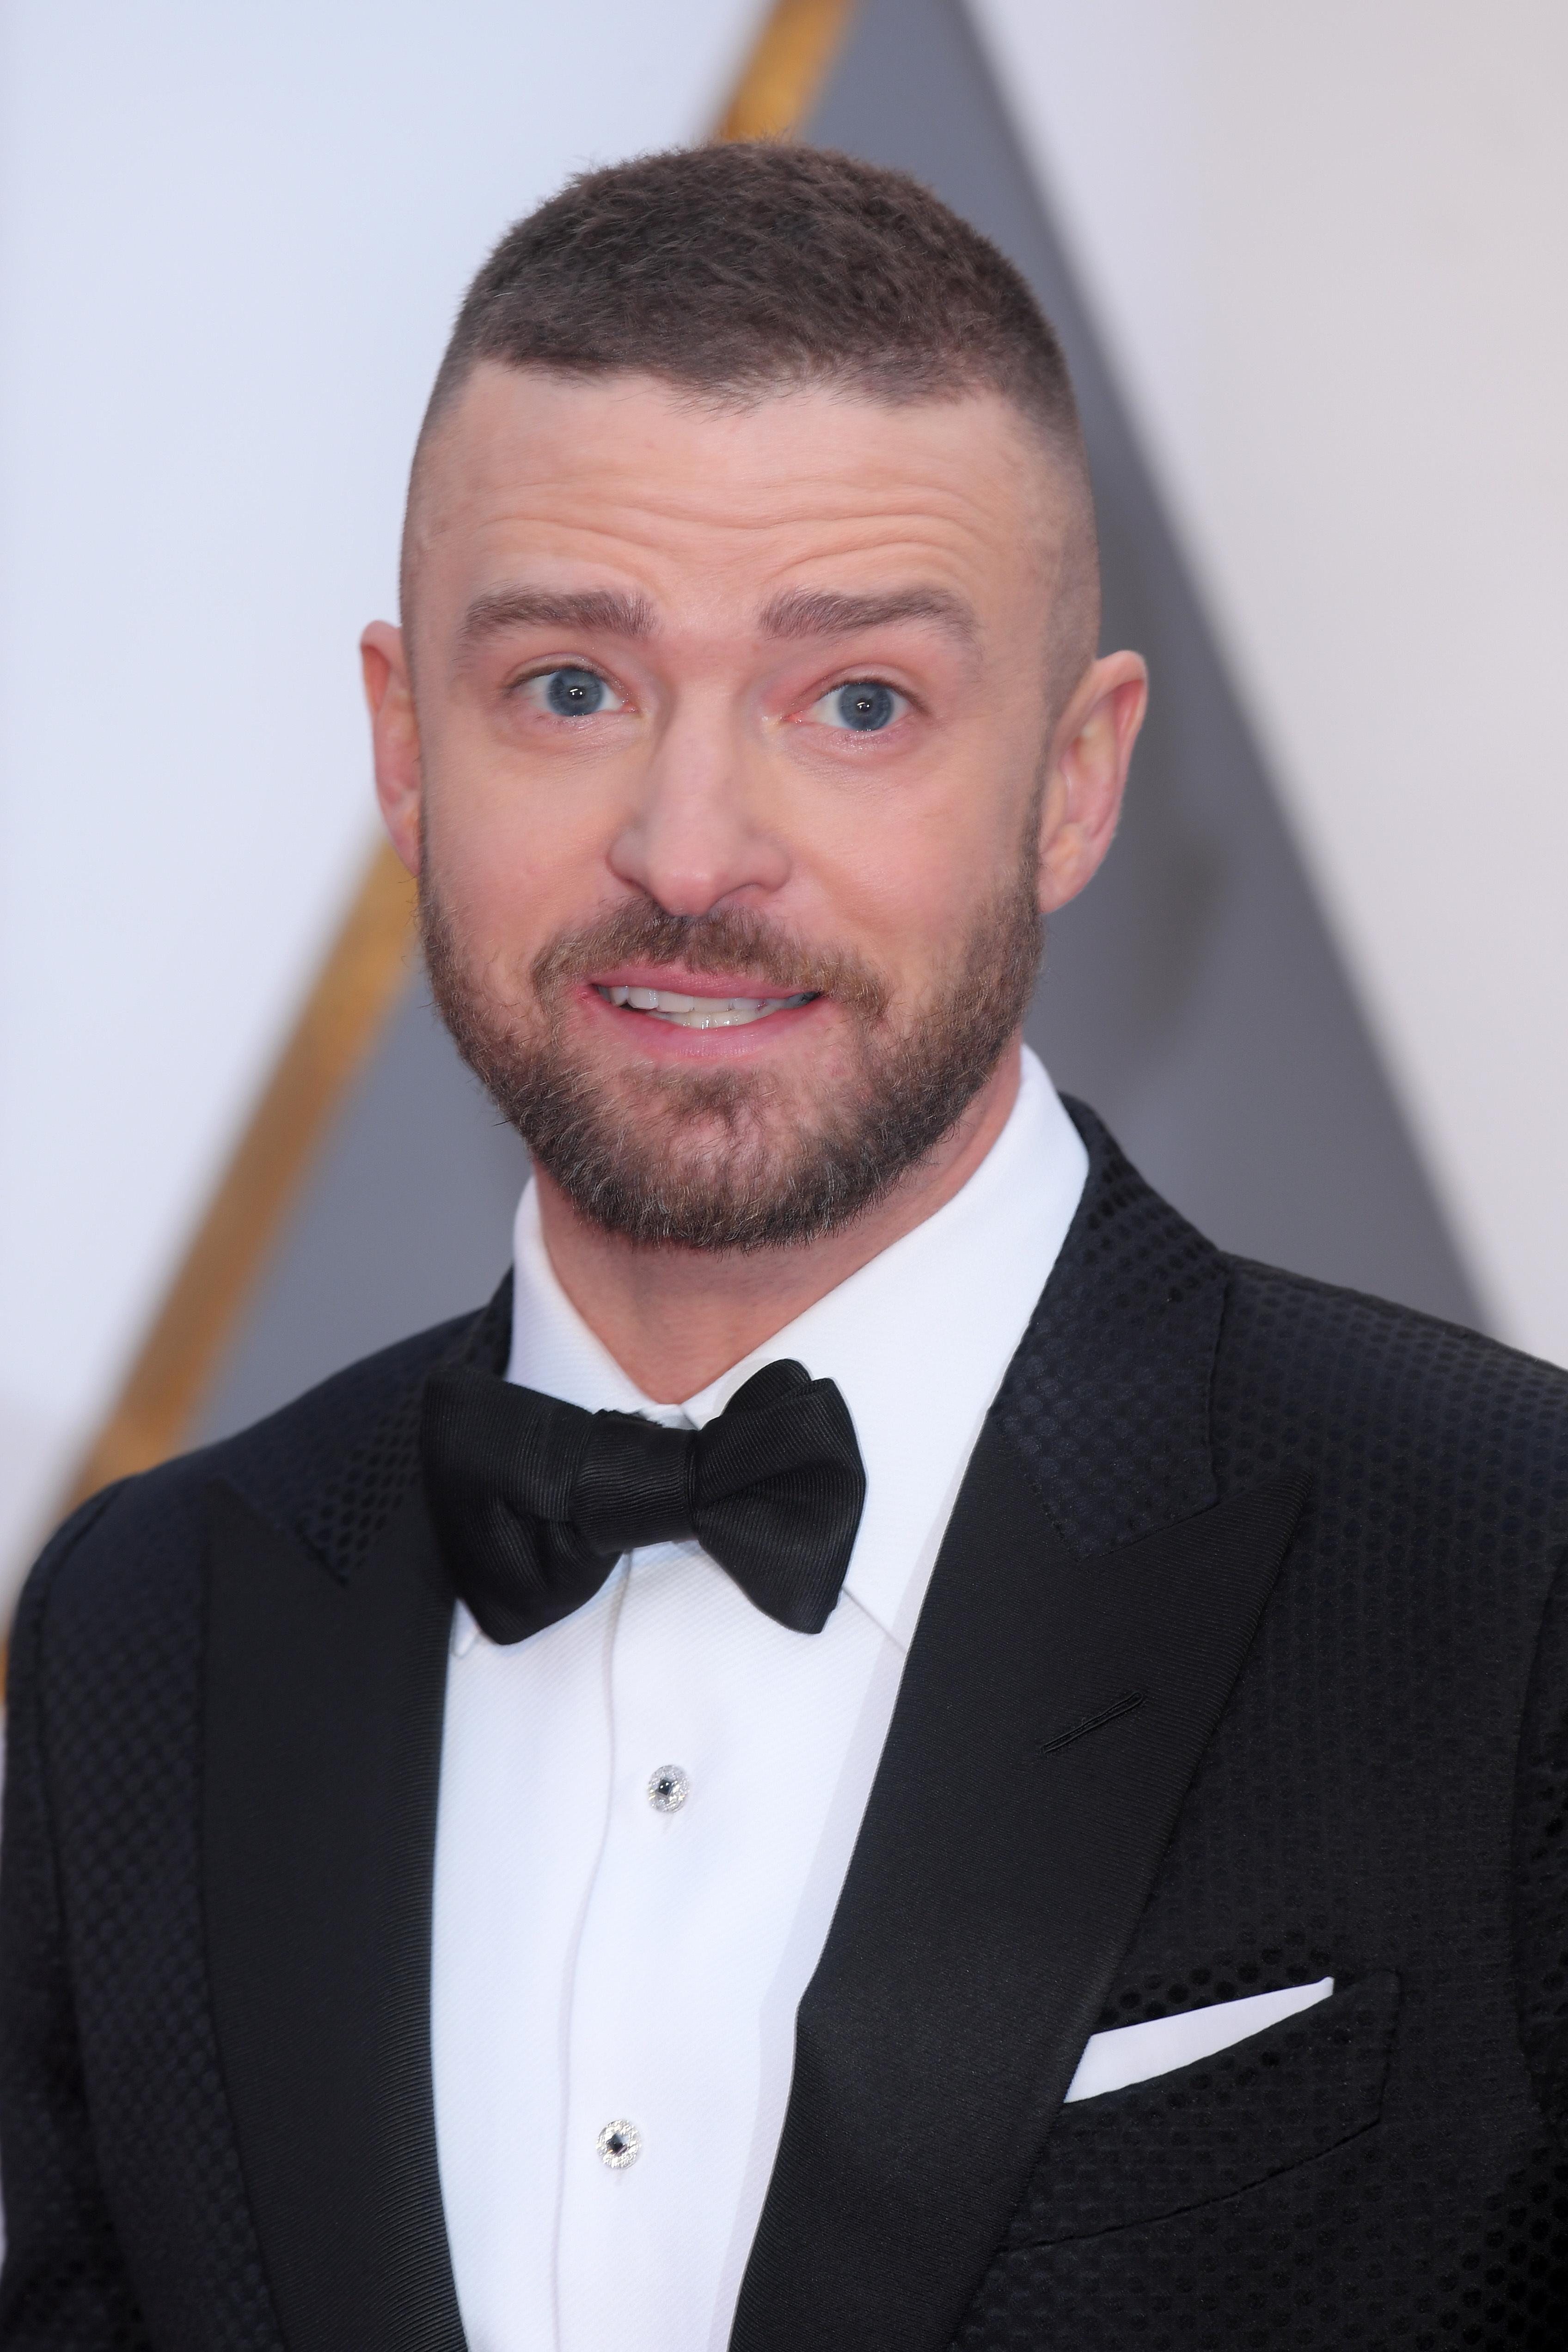 Justin Timberlake is humbled by fatherhood